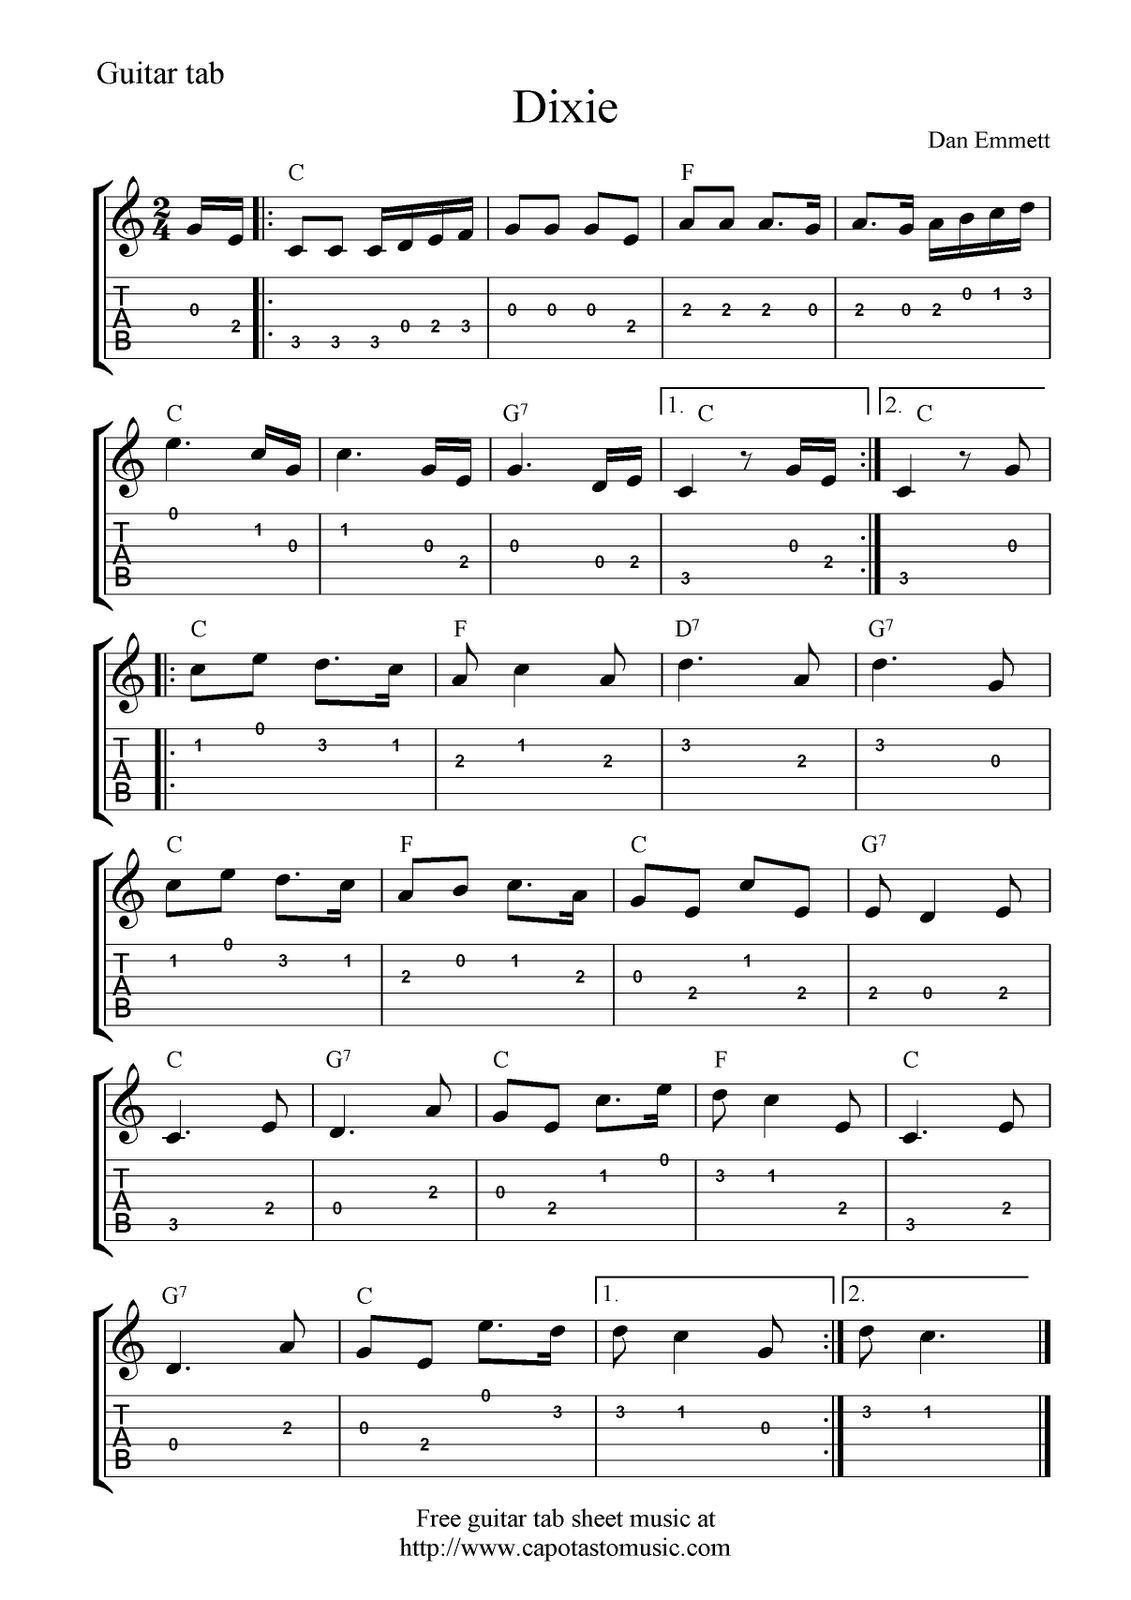 Guitar Music Sheets For Beginners | Free Guitar Tab Sheet Music - Free Printable Guitar Tabs For Beginners